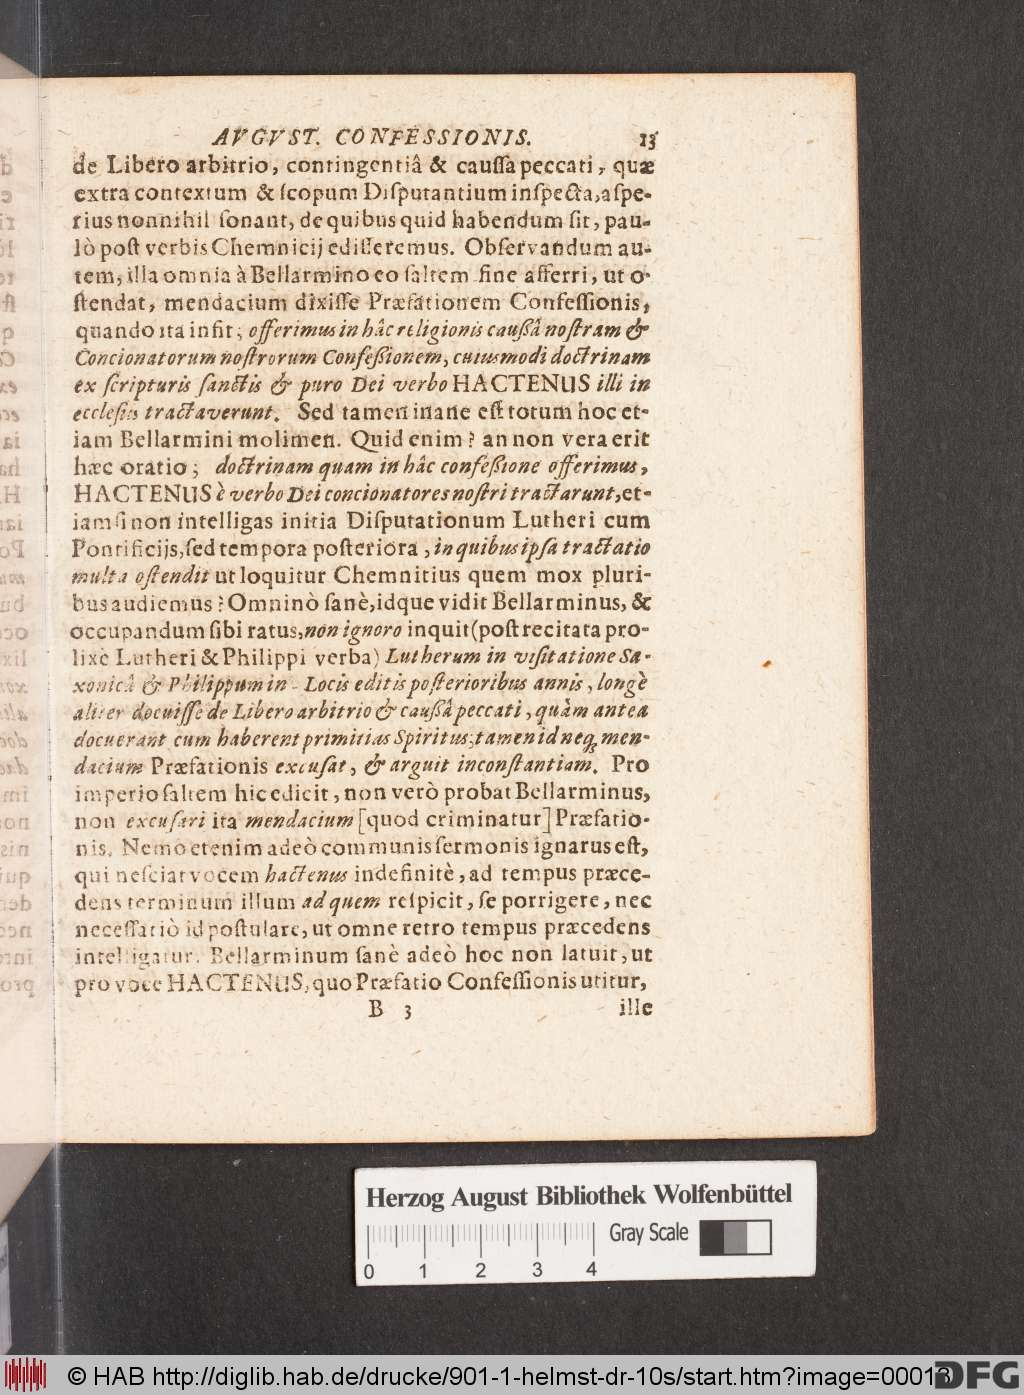 http://diglib.hab.de/drucke/901-1-helmst-dr-10s/00013.jpg